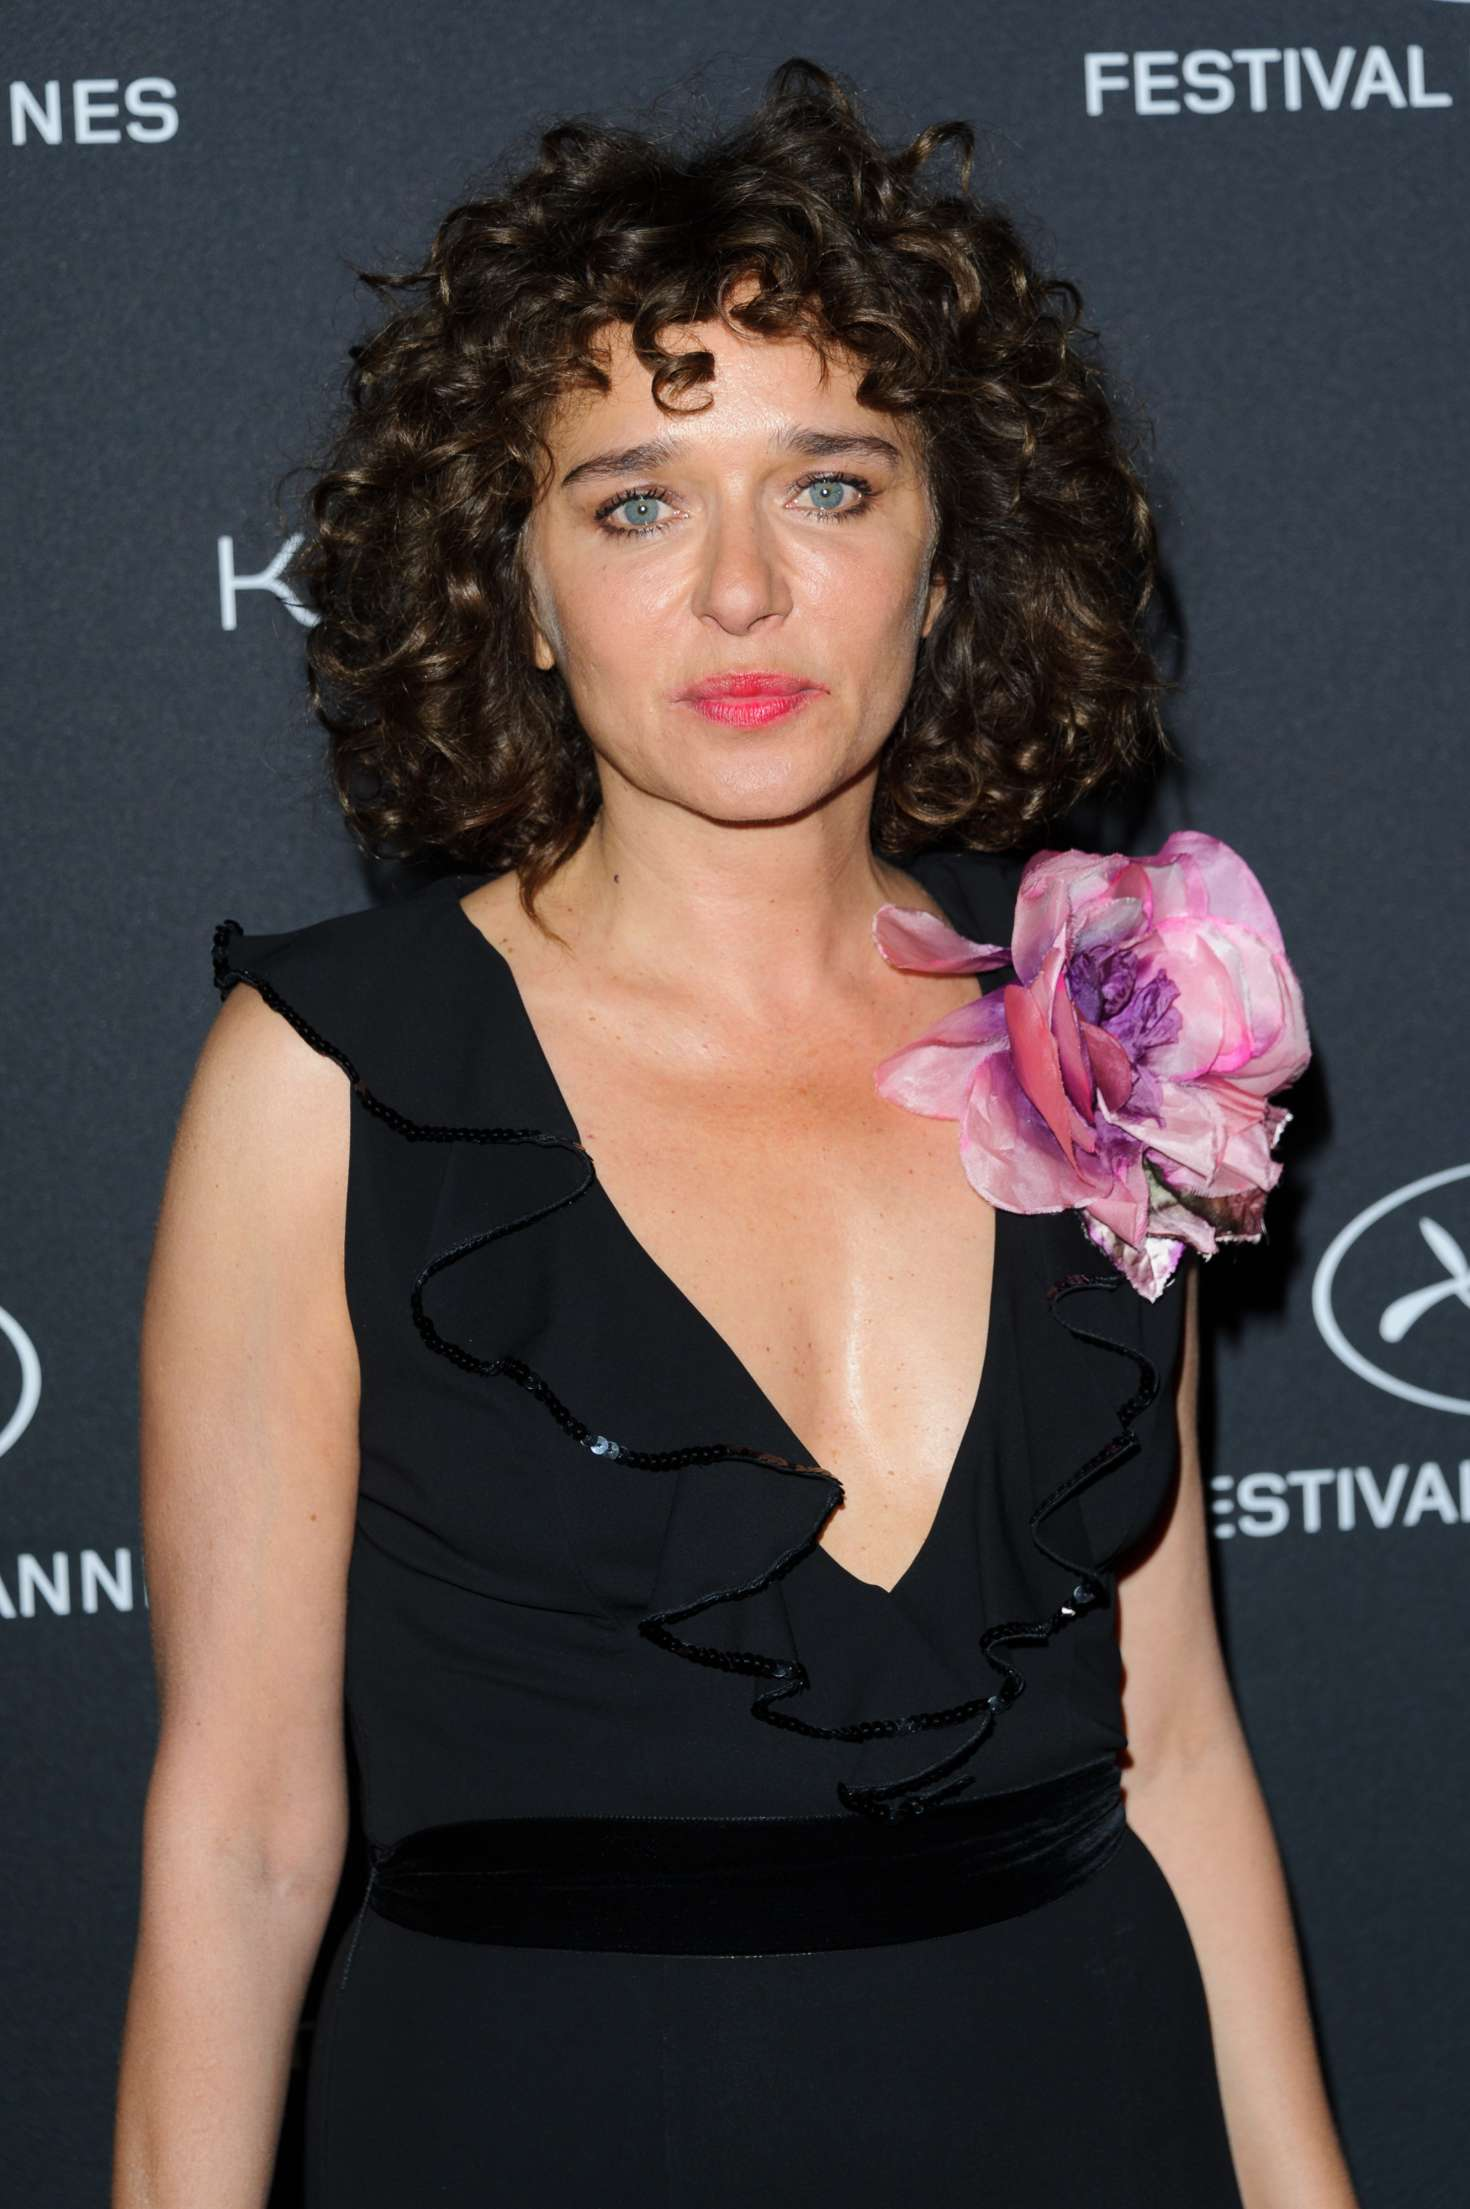 Valeria Golino - Kering Women in Motion Awards 2017 in Cannes